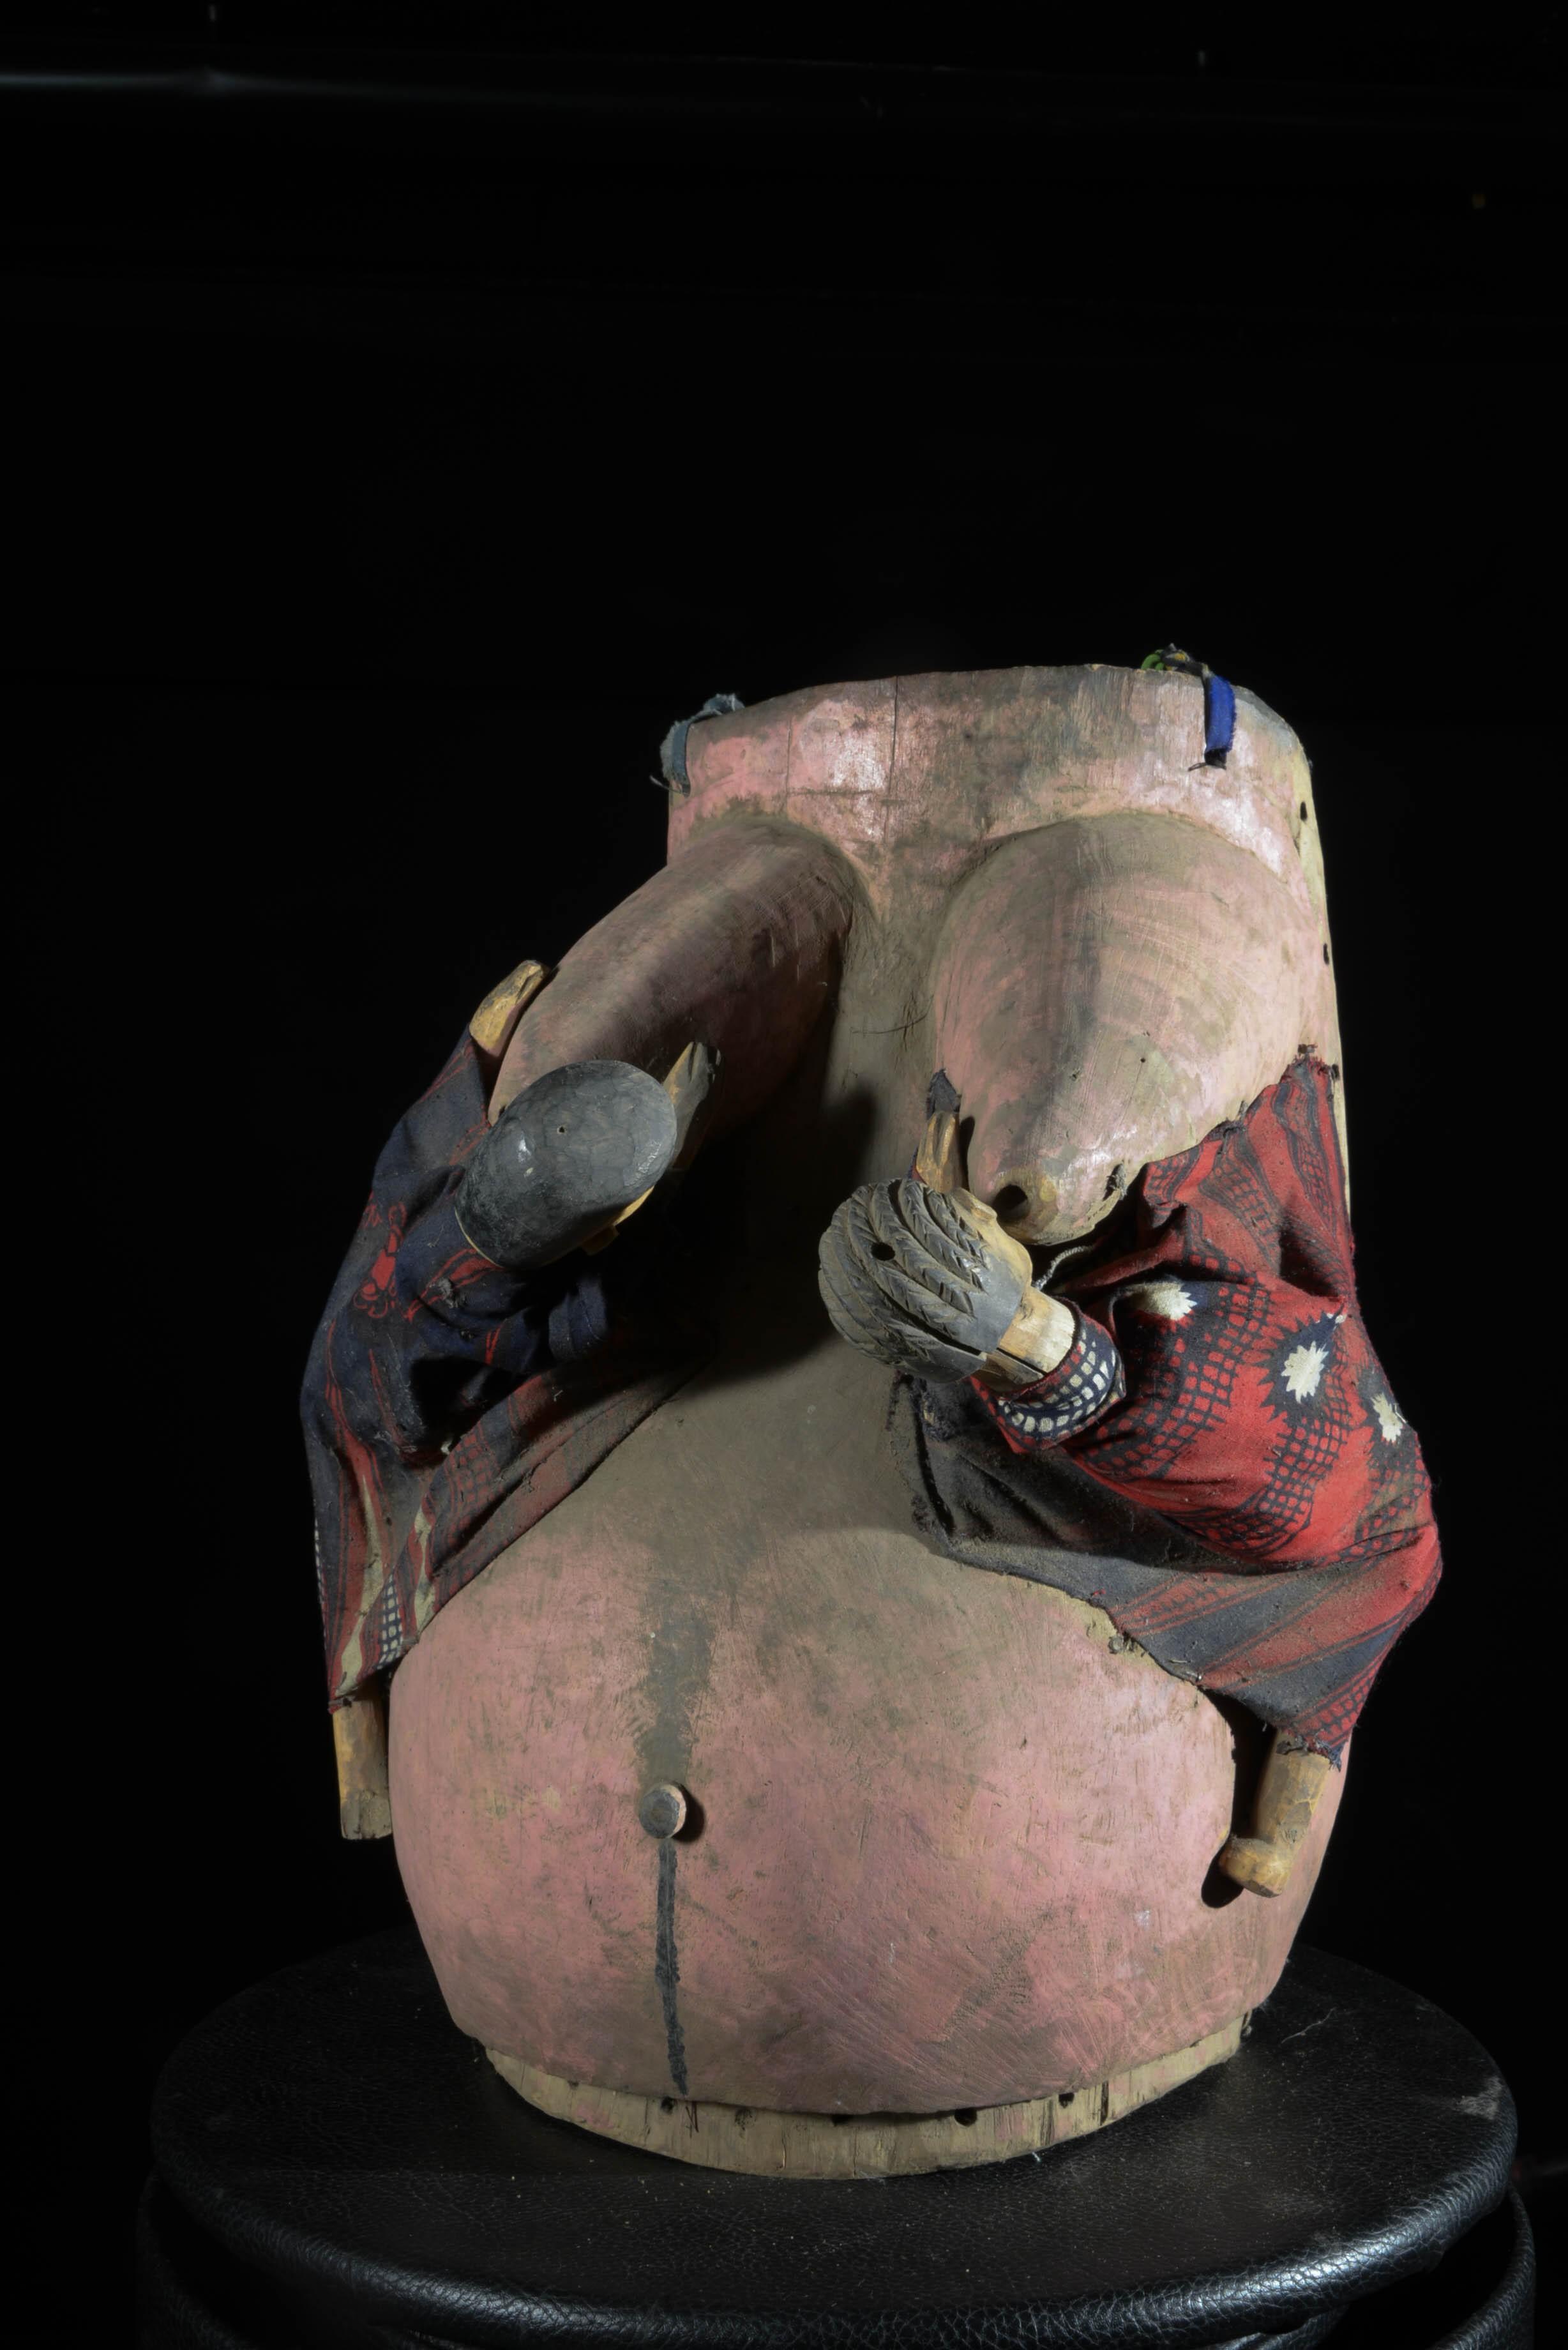 Masque ventre - Yoruba - Nigeria / Benin